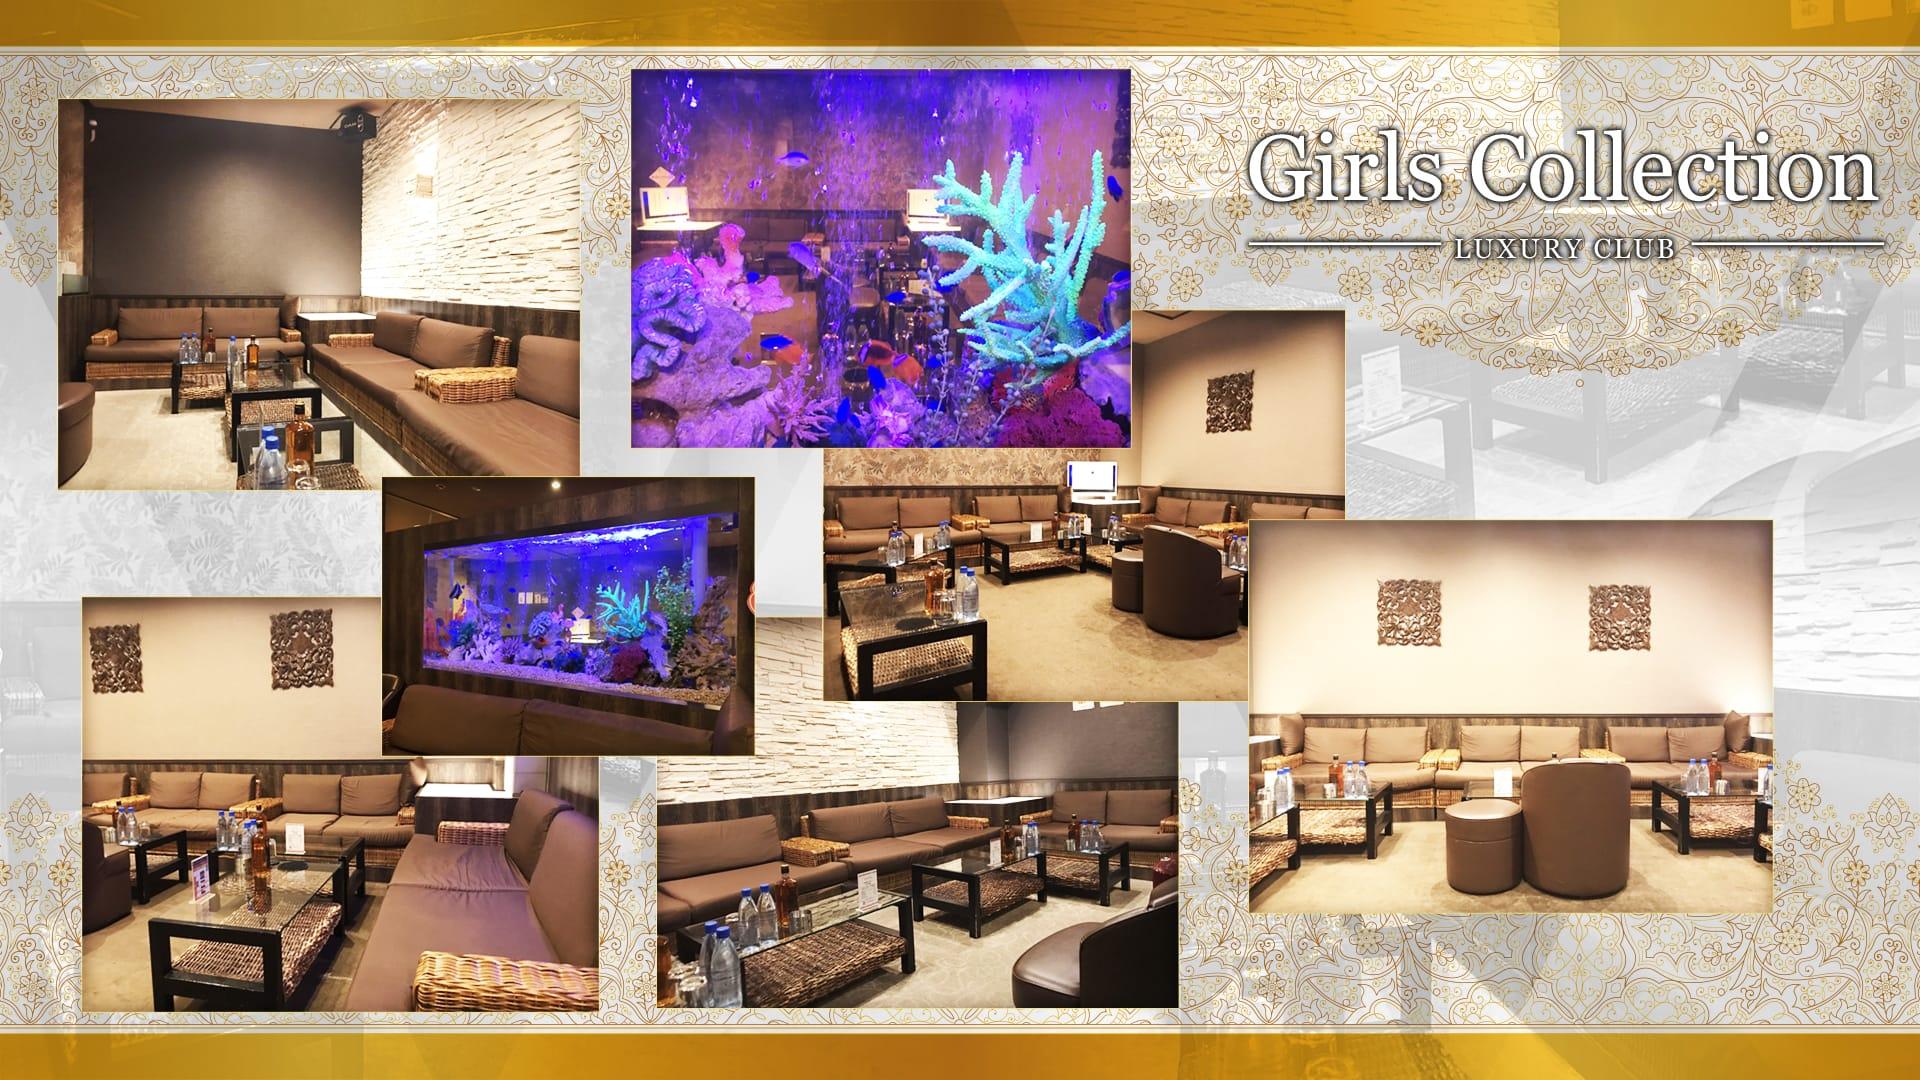 Club Girl's COLLECTION(クラブ ガールズコレクション) 川崎キャバクラ TOP画像